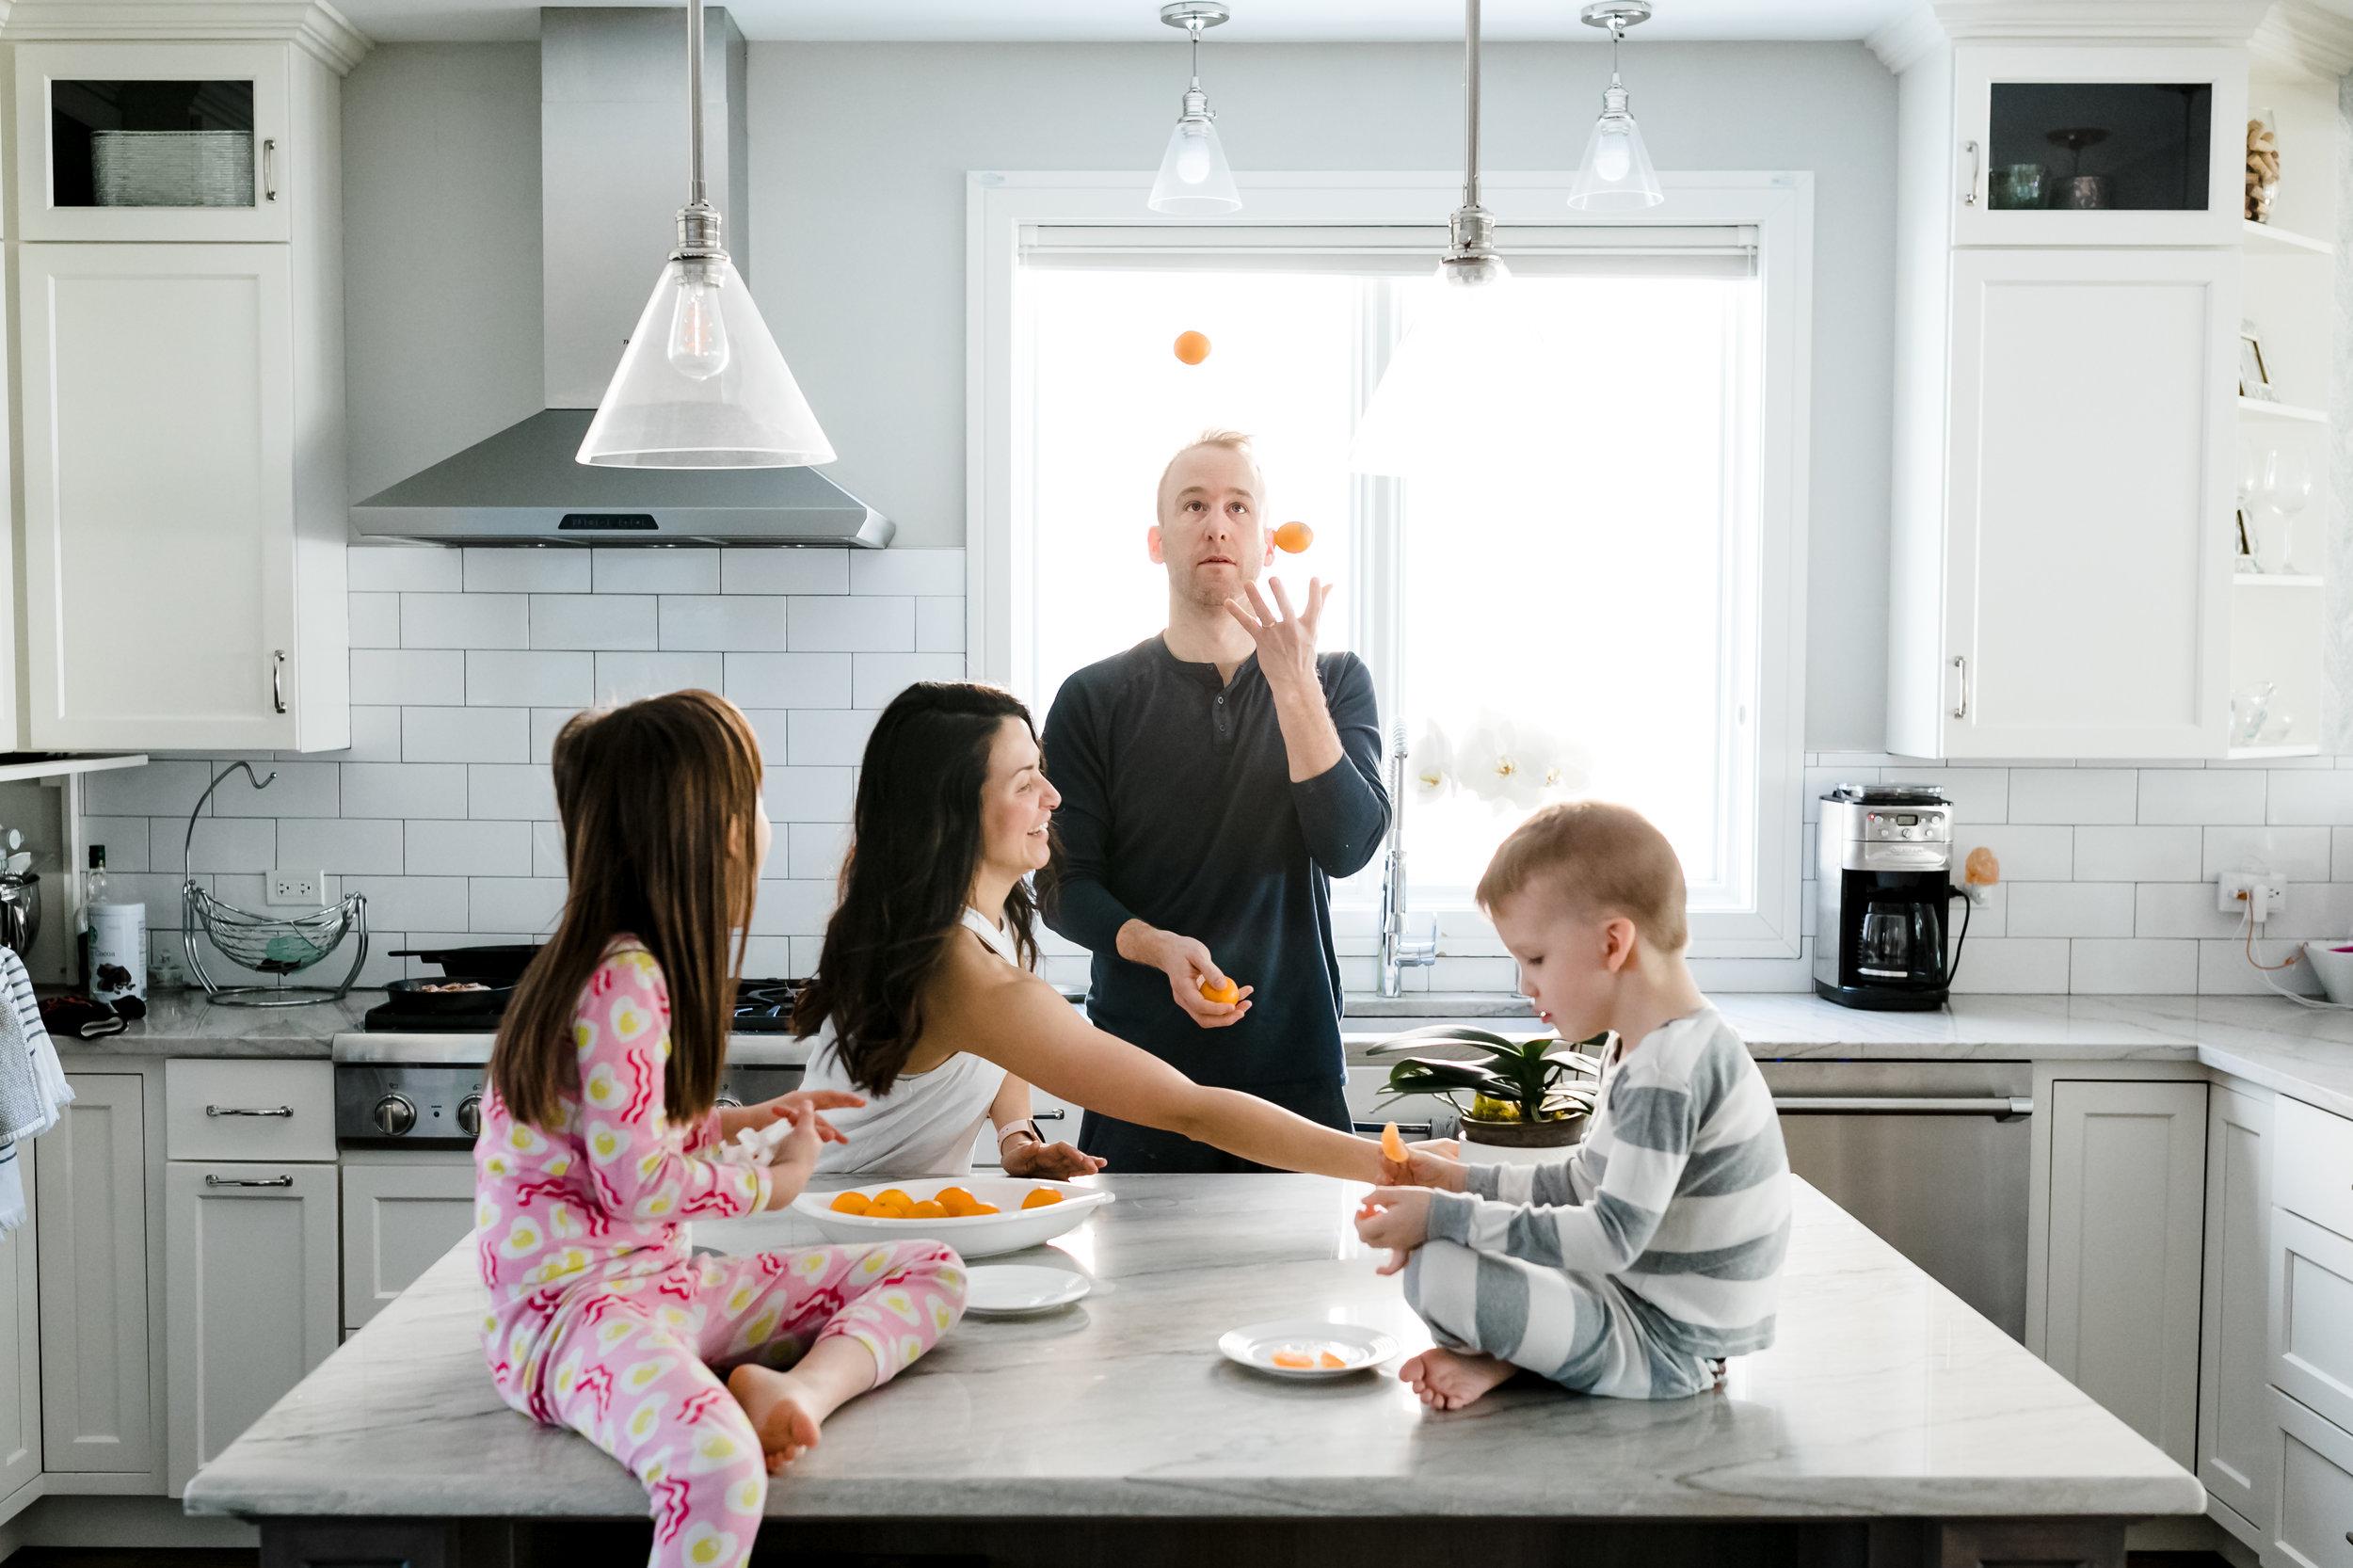 ©JGP2019_chicago-kitchen-family-breakfast-balance-healthy-habits